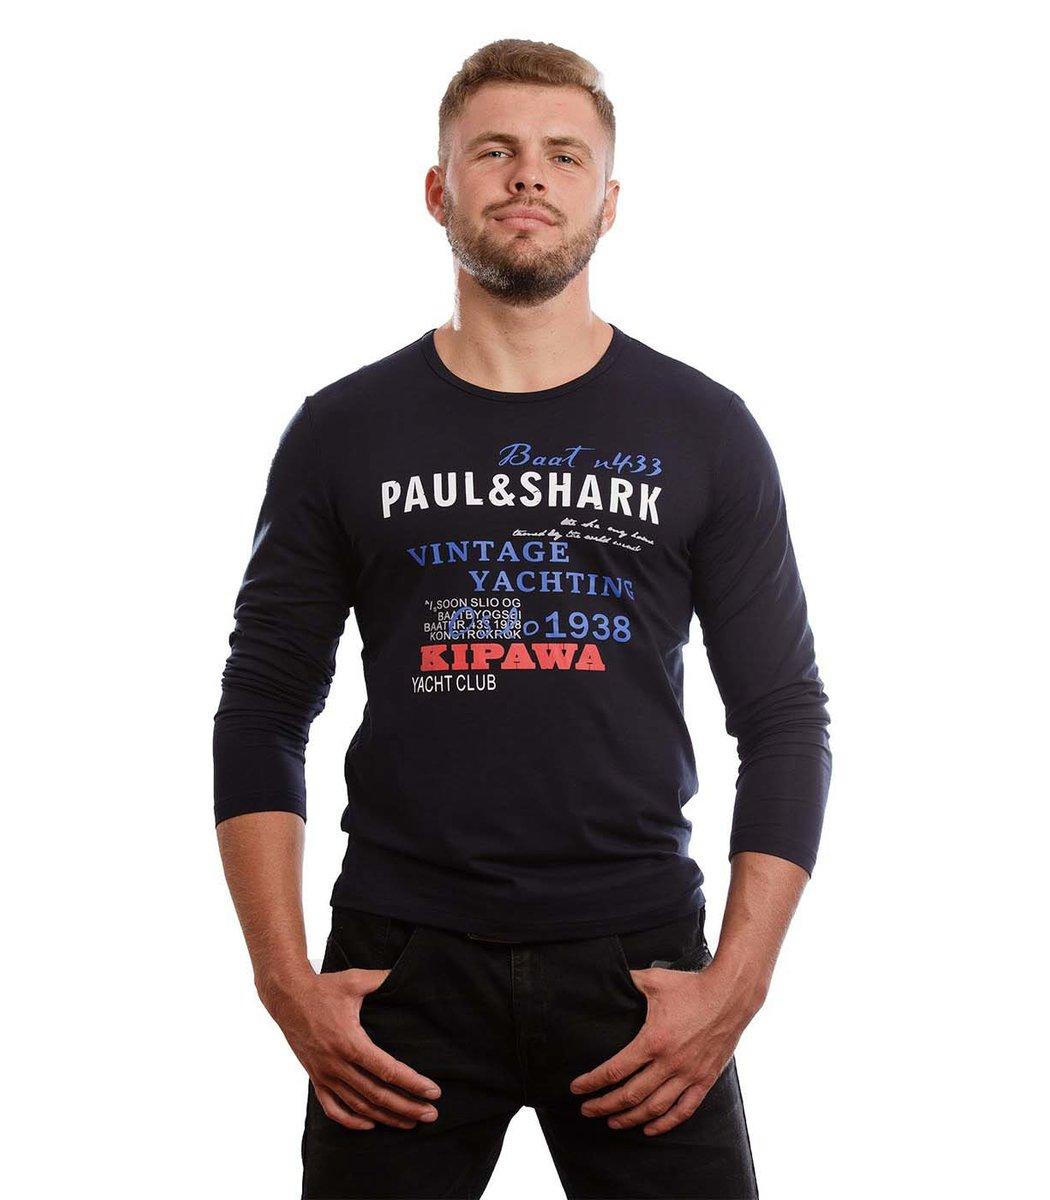 Синий лонгслив  Paul Shark L2 (Синий) - Синий - Вид 2